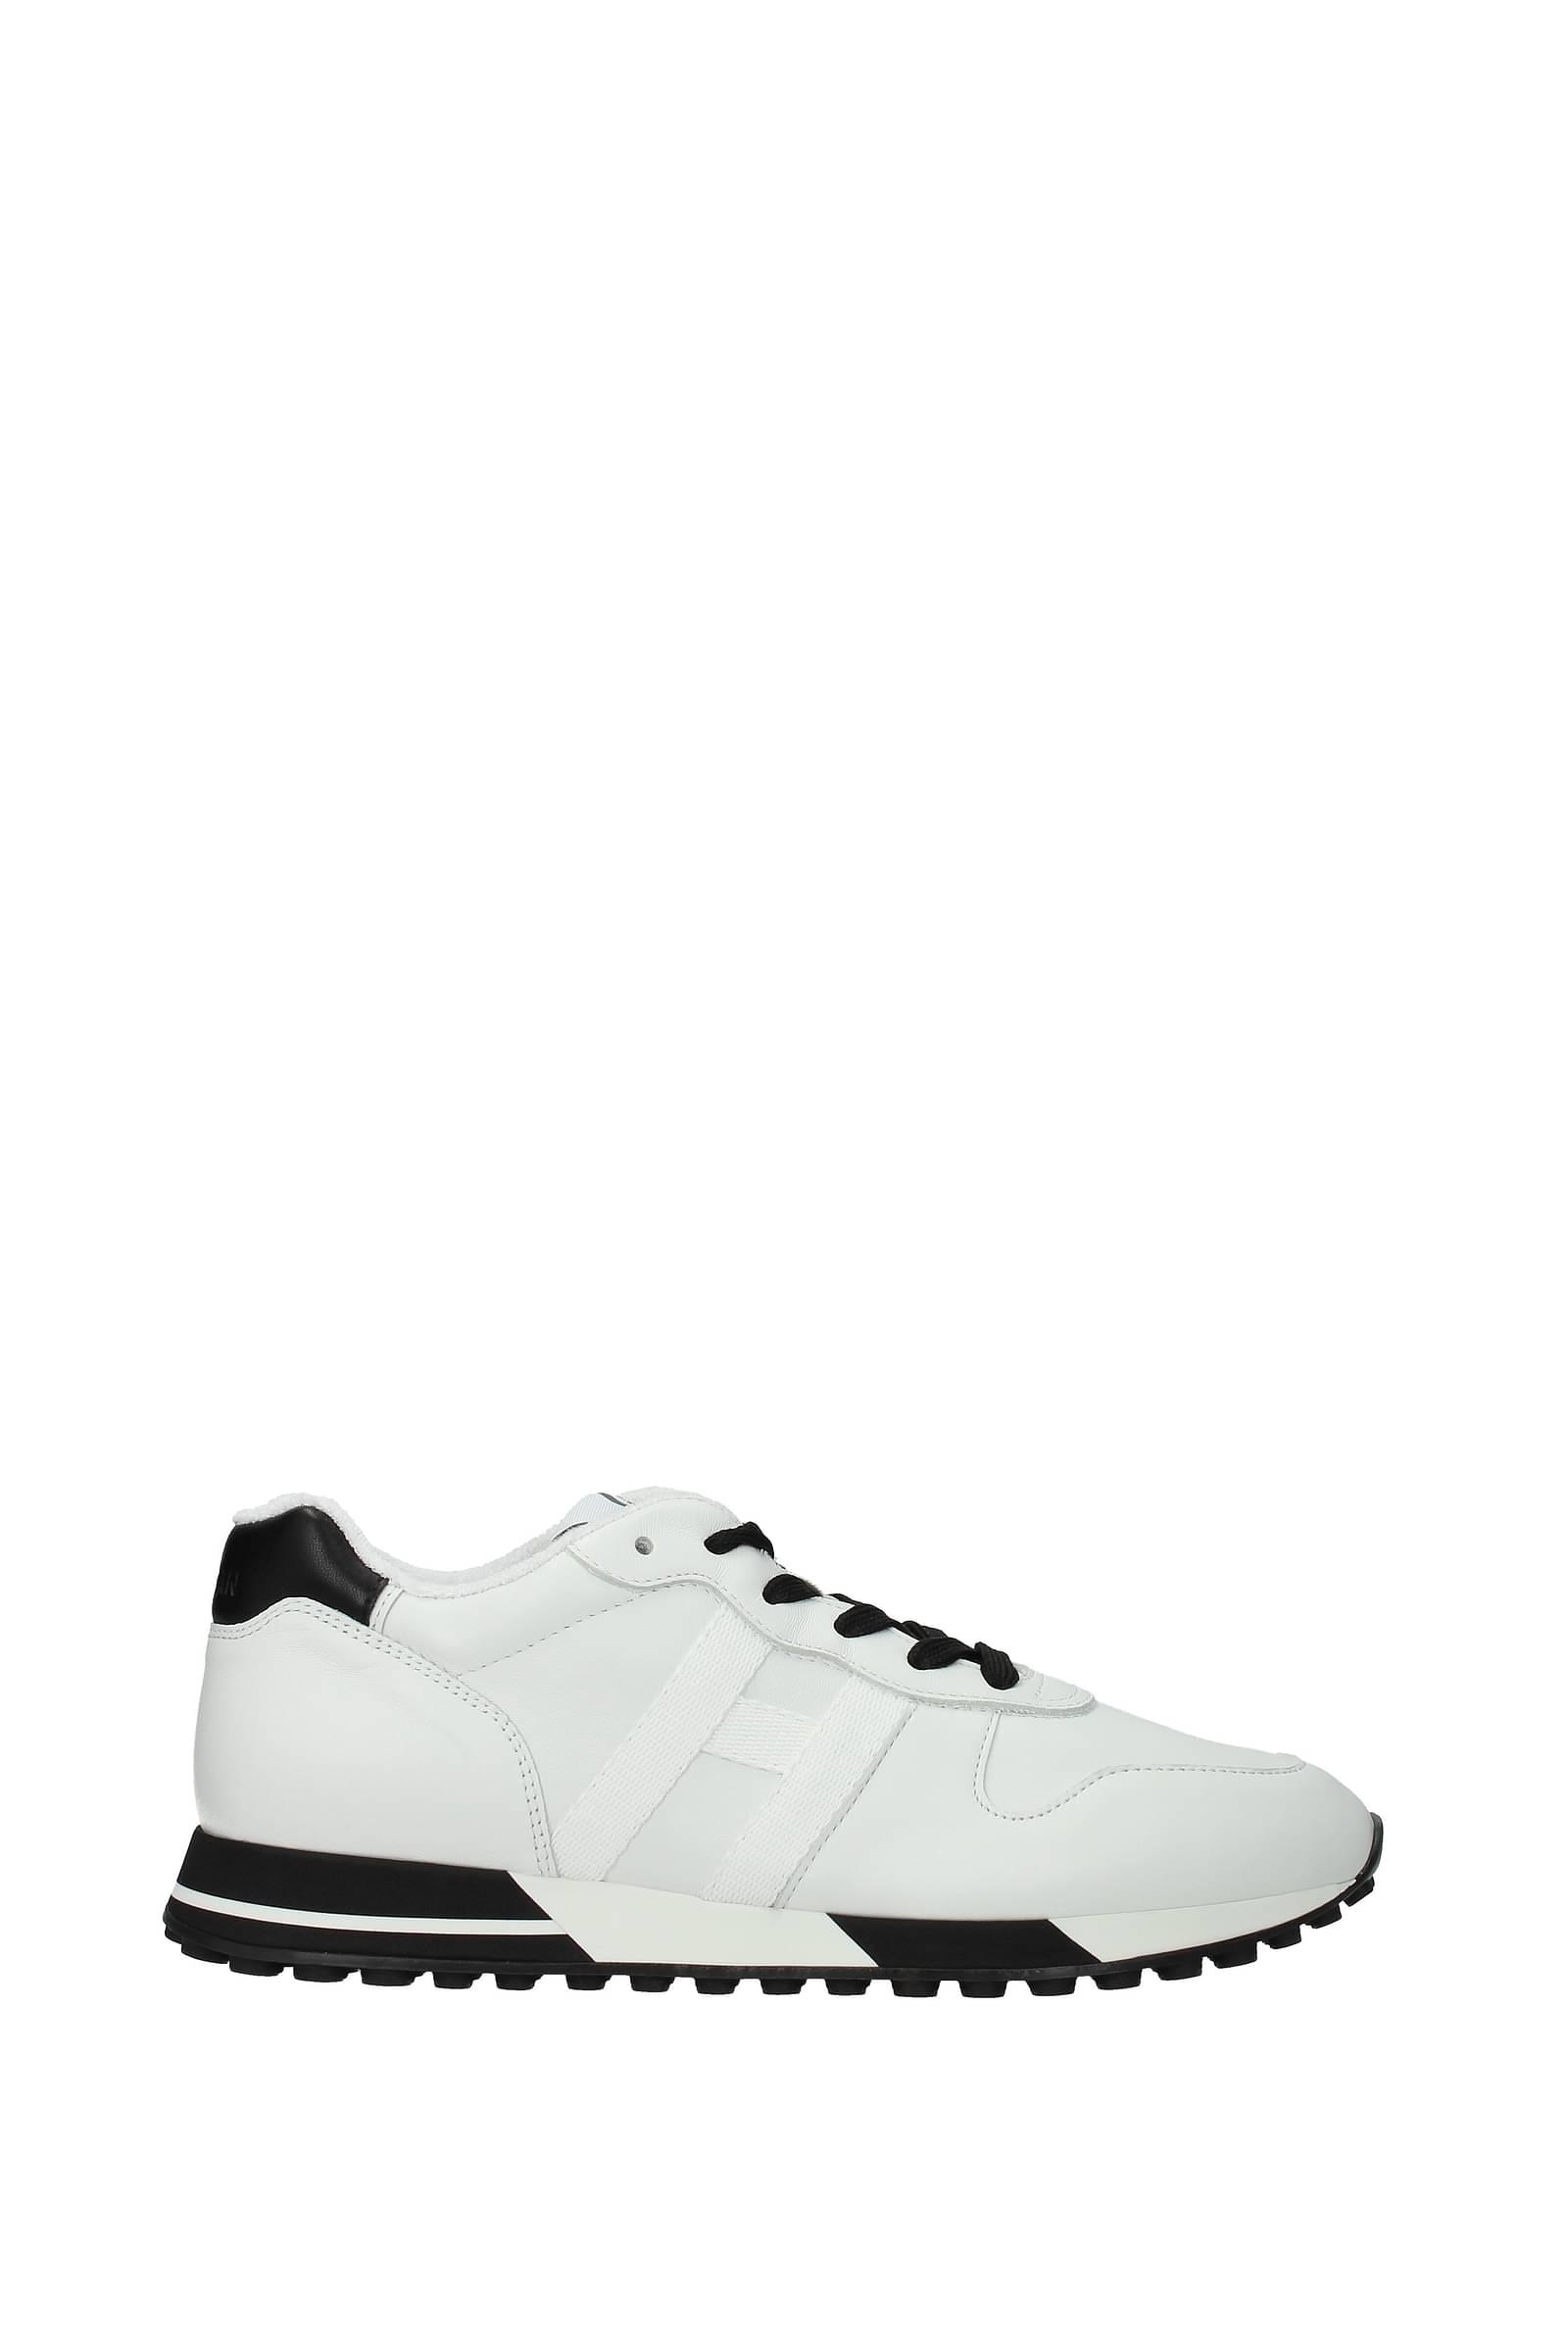 Hogan Sneakers h383 Men Leather White Black